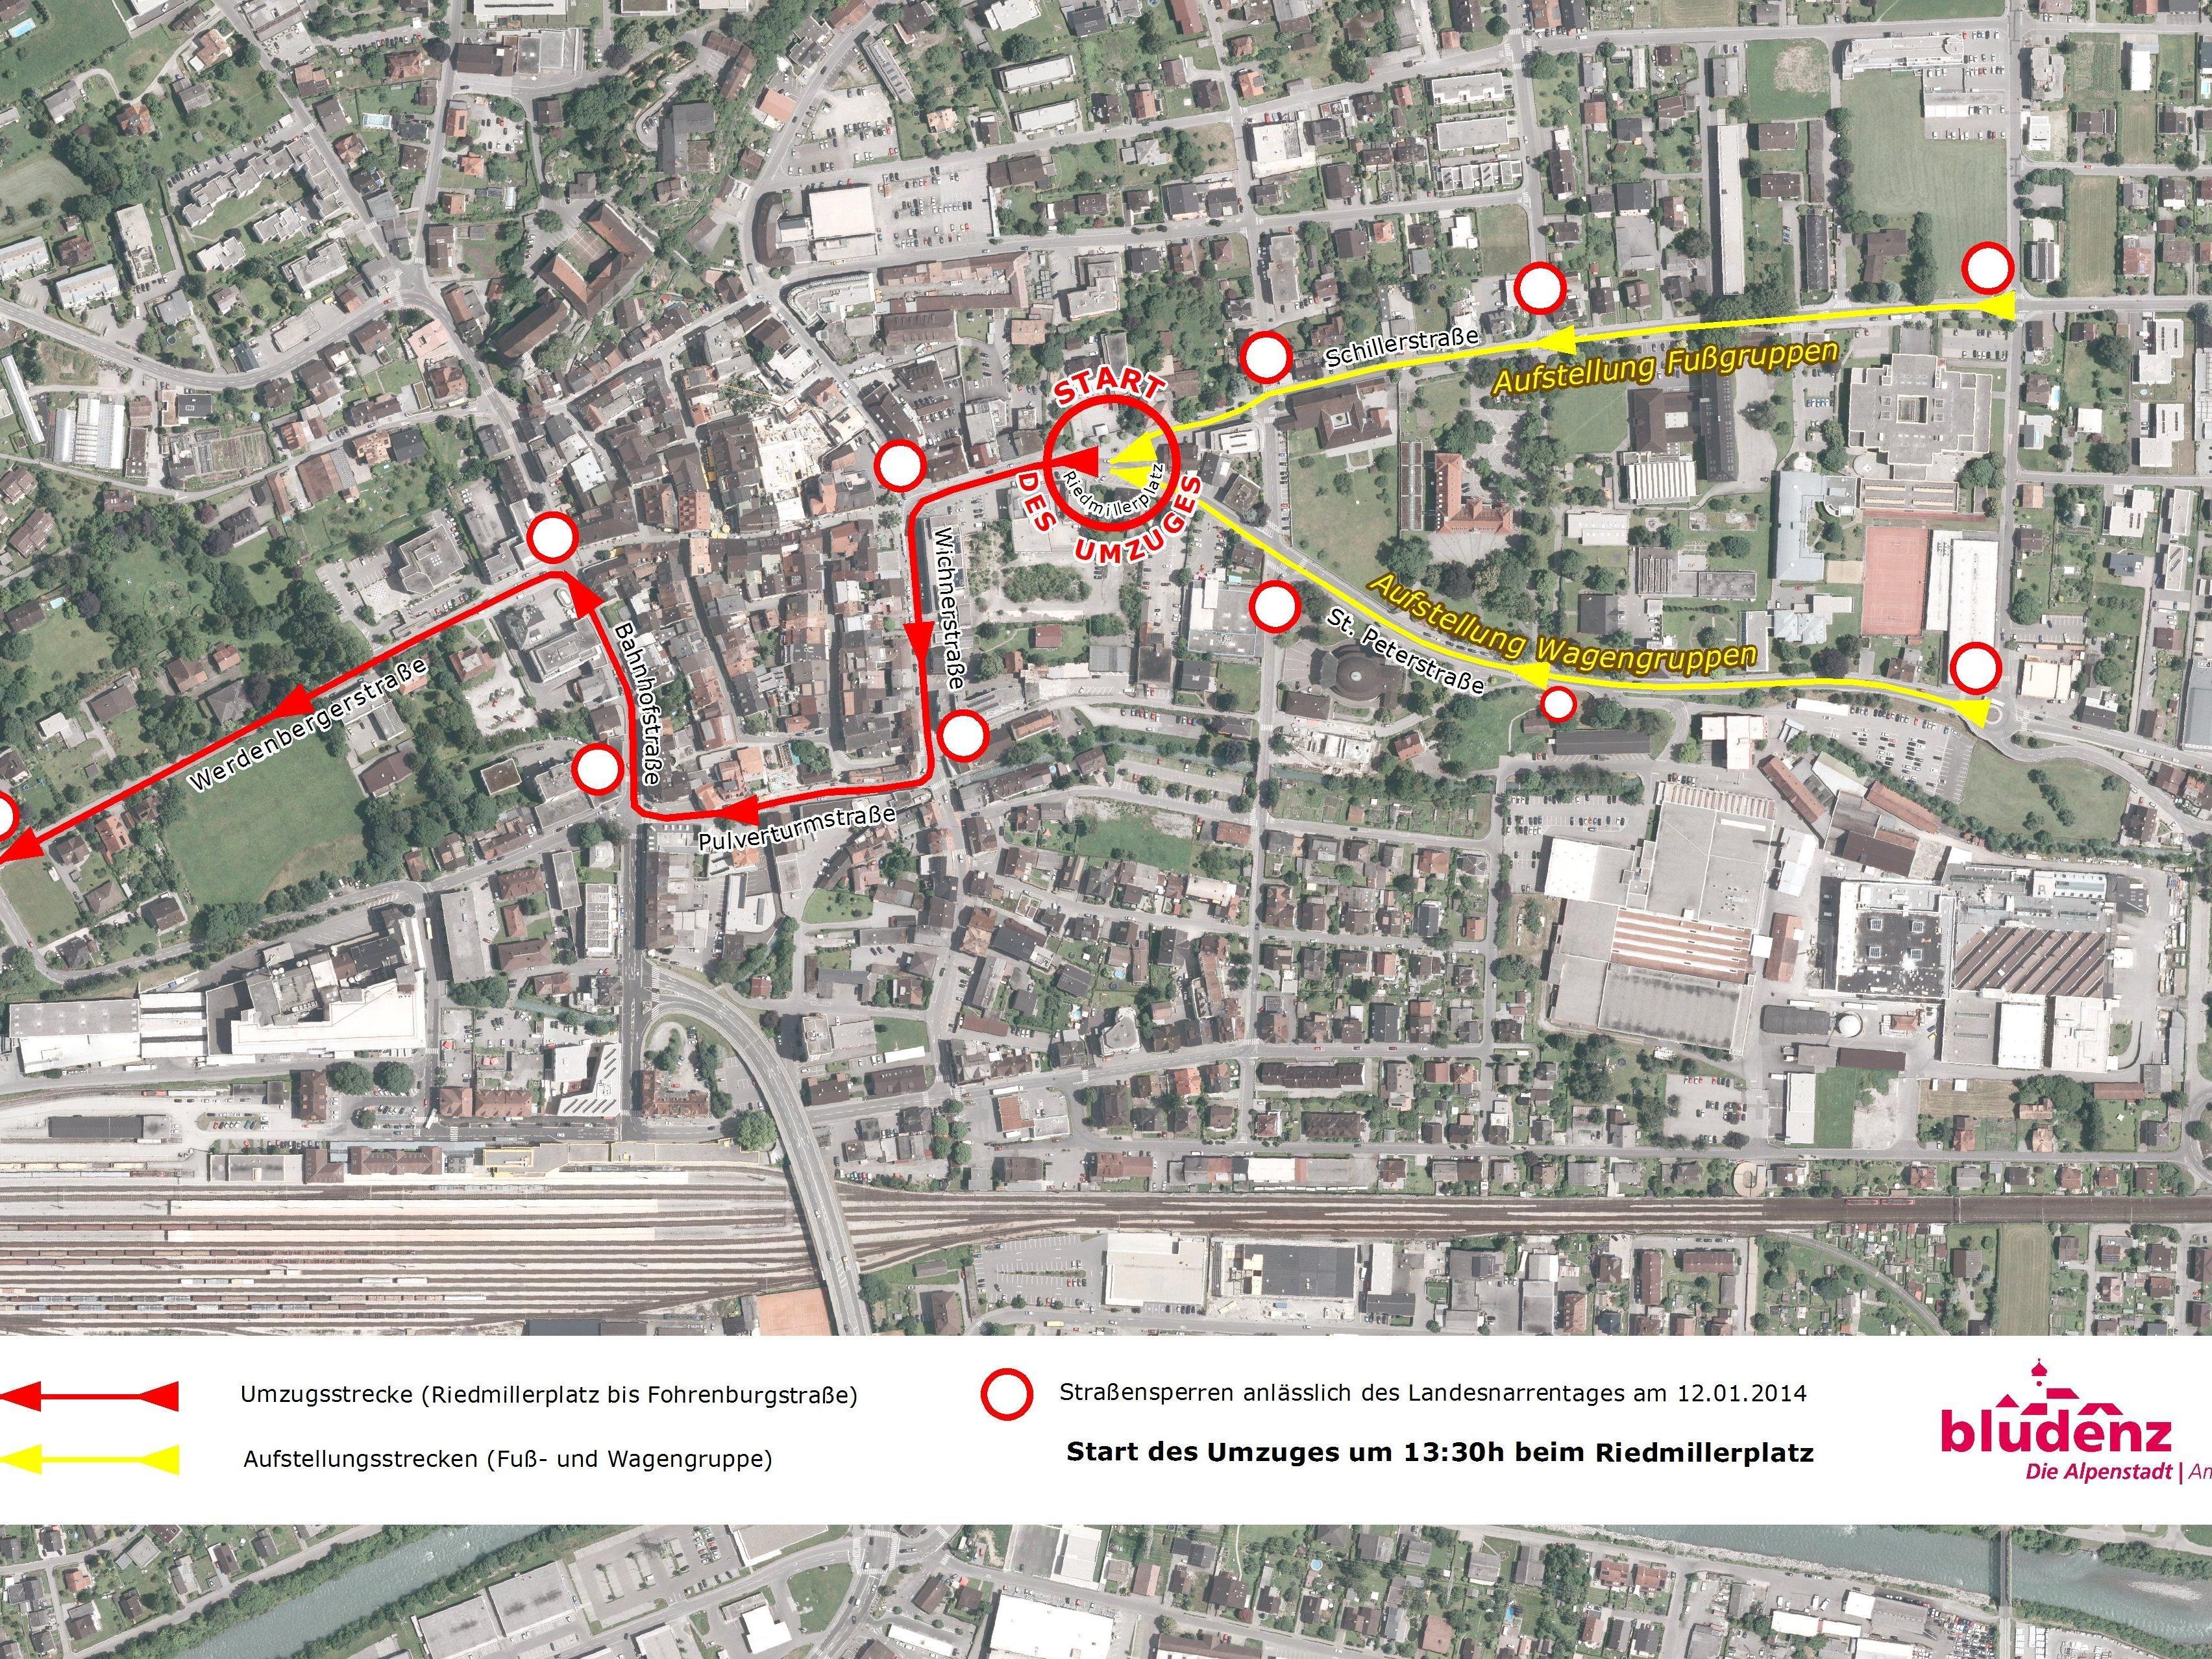 Narrentag 2014: Umfangreiche Straßensperren – Lokale Umleitungen sind beschildert.